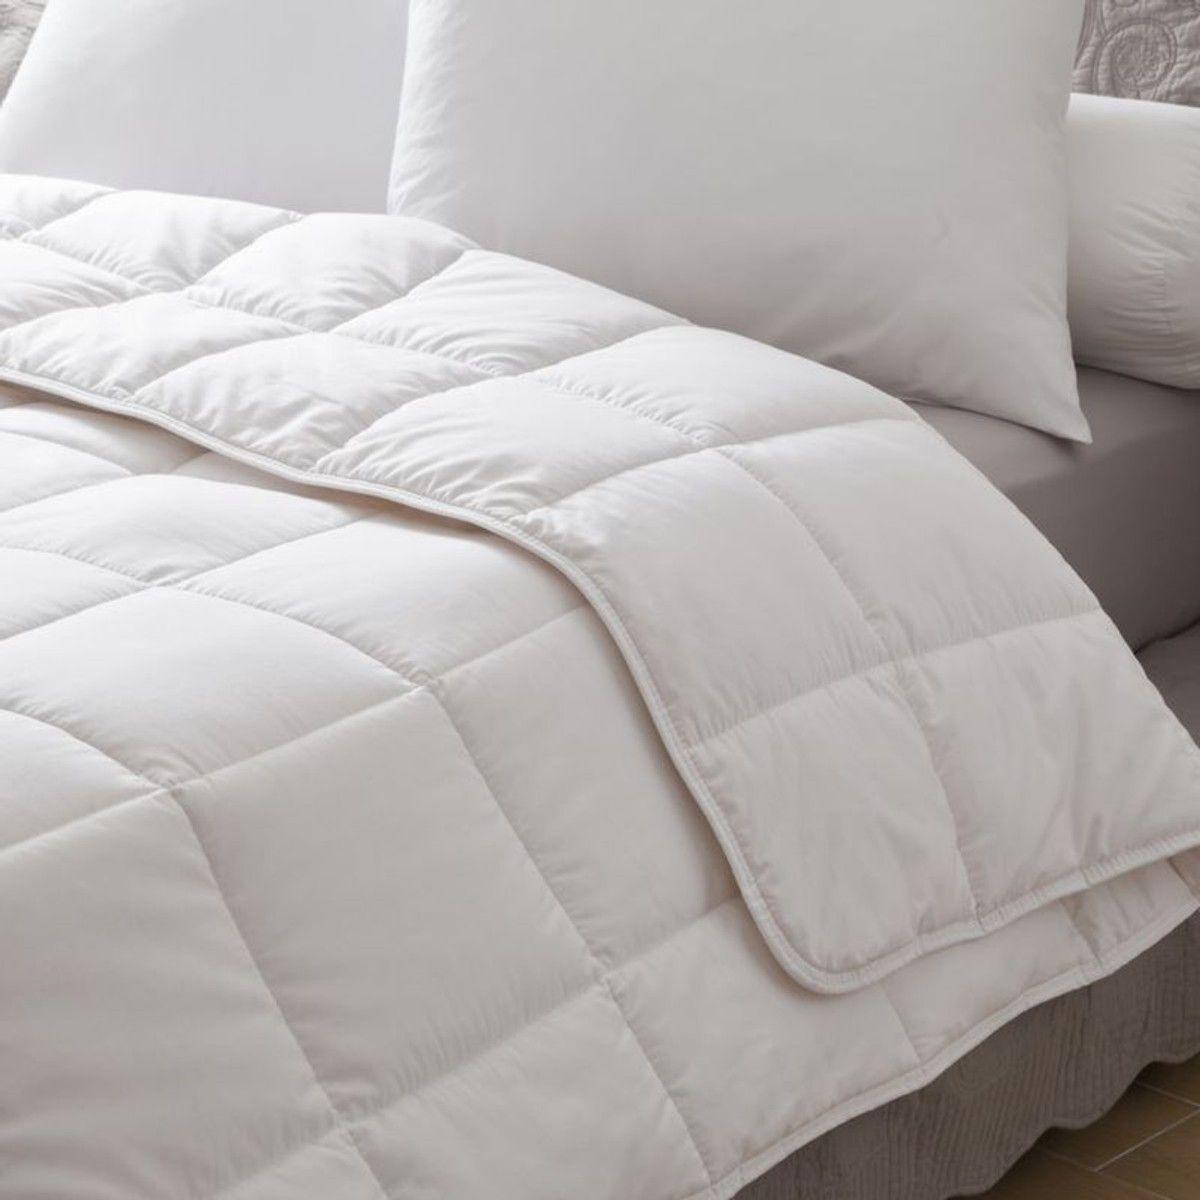 Couette Wash Cotton - Taille : 220x240 cm;